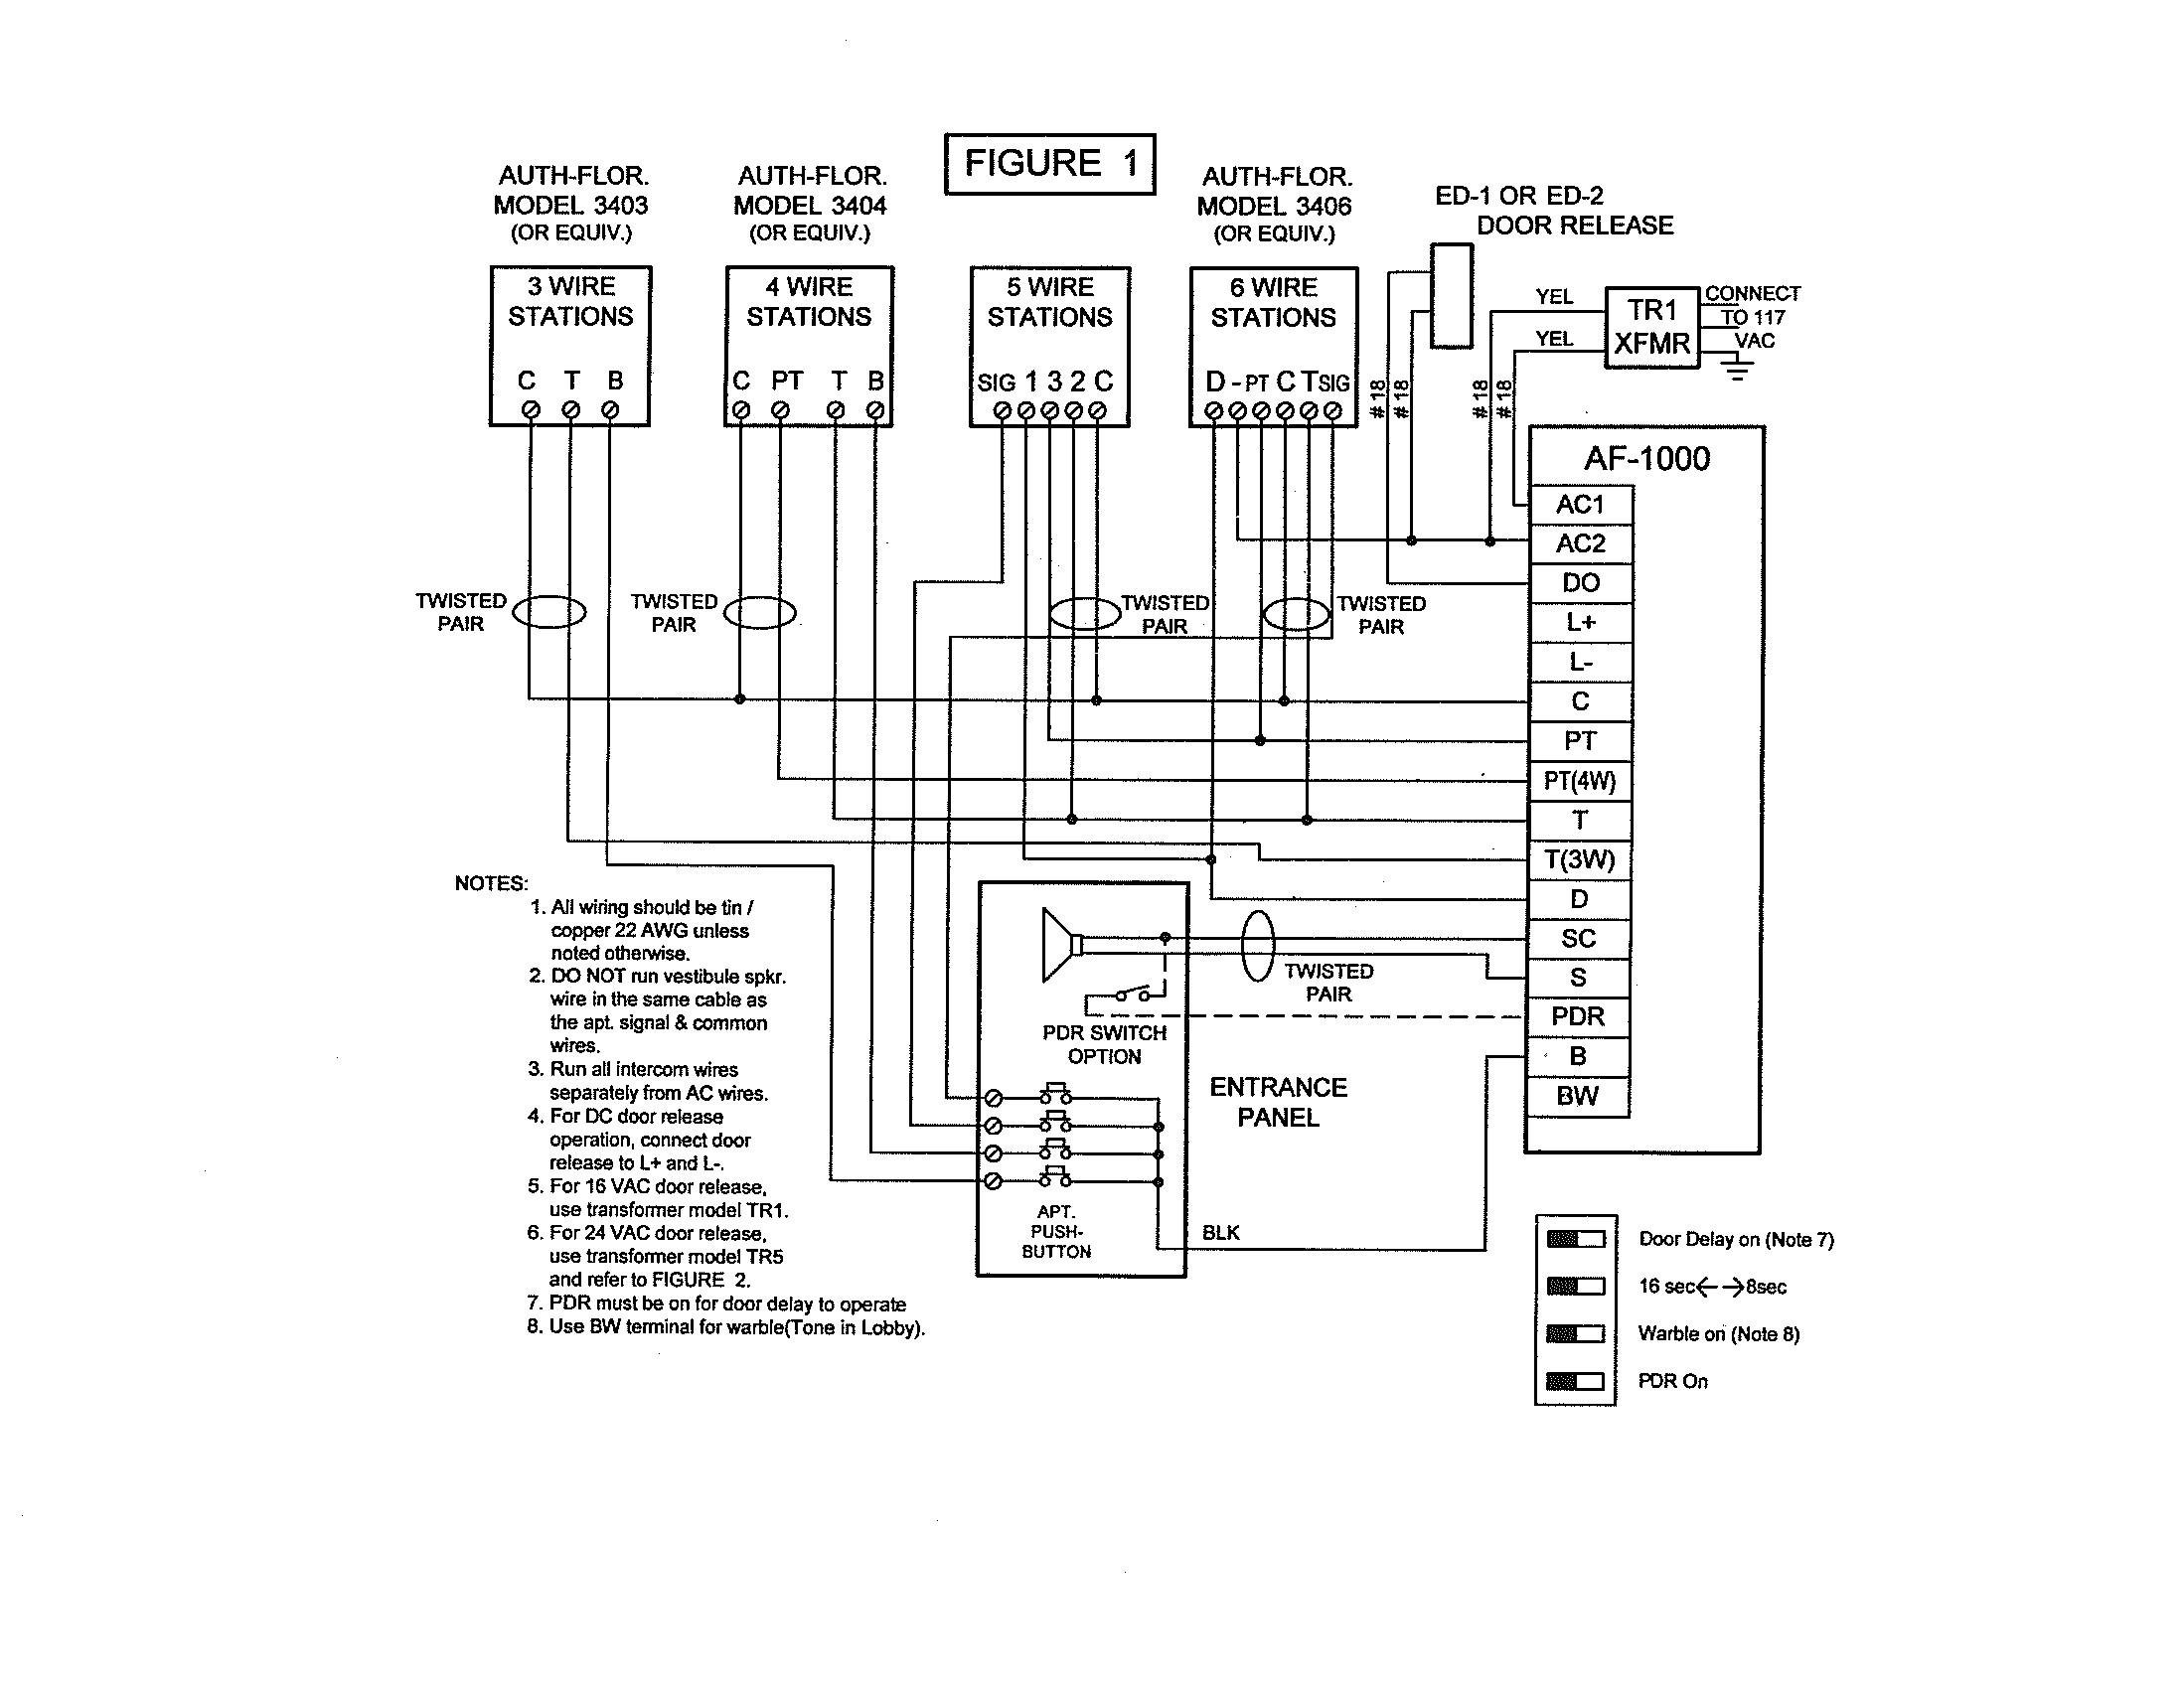 nutone products nutone ima4406 intercom specs and wiring diagram